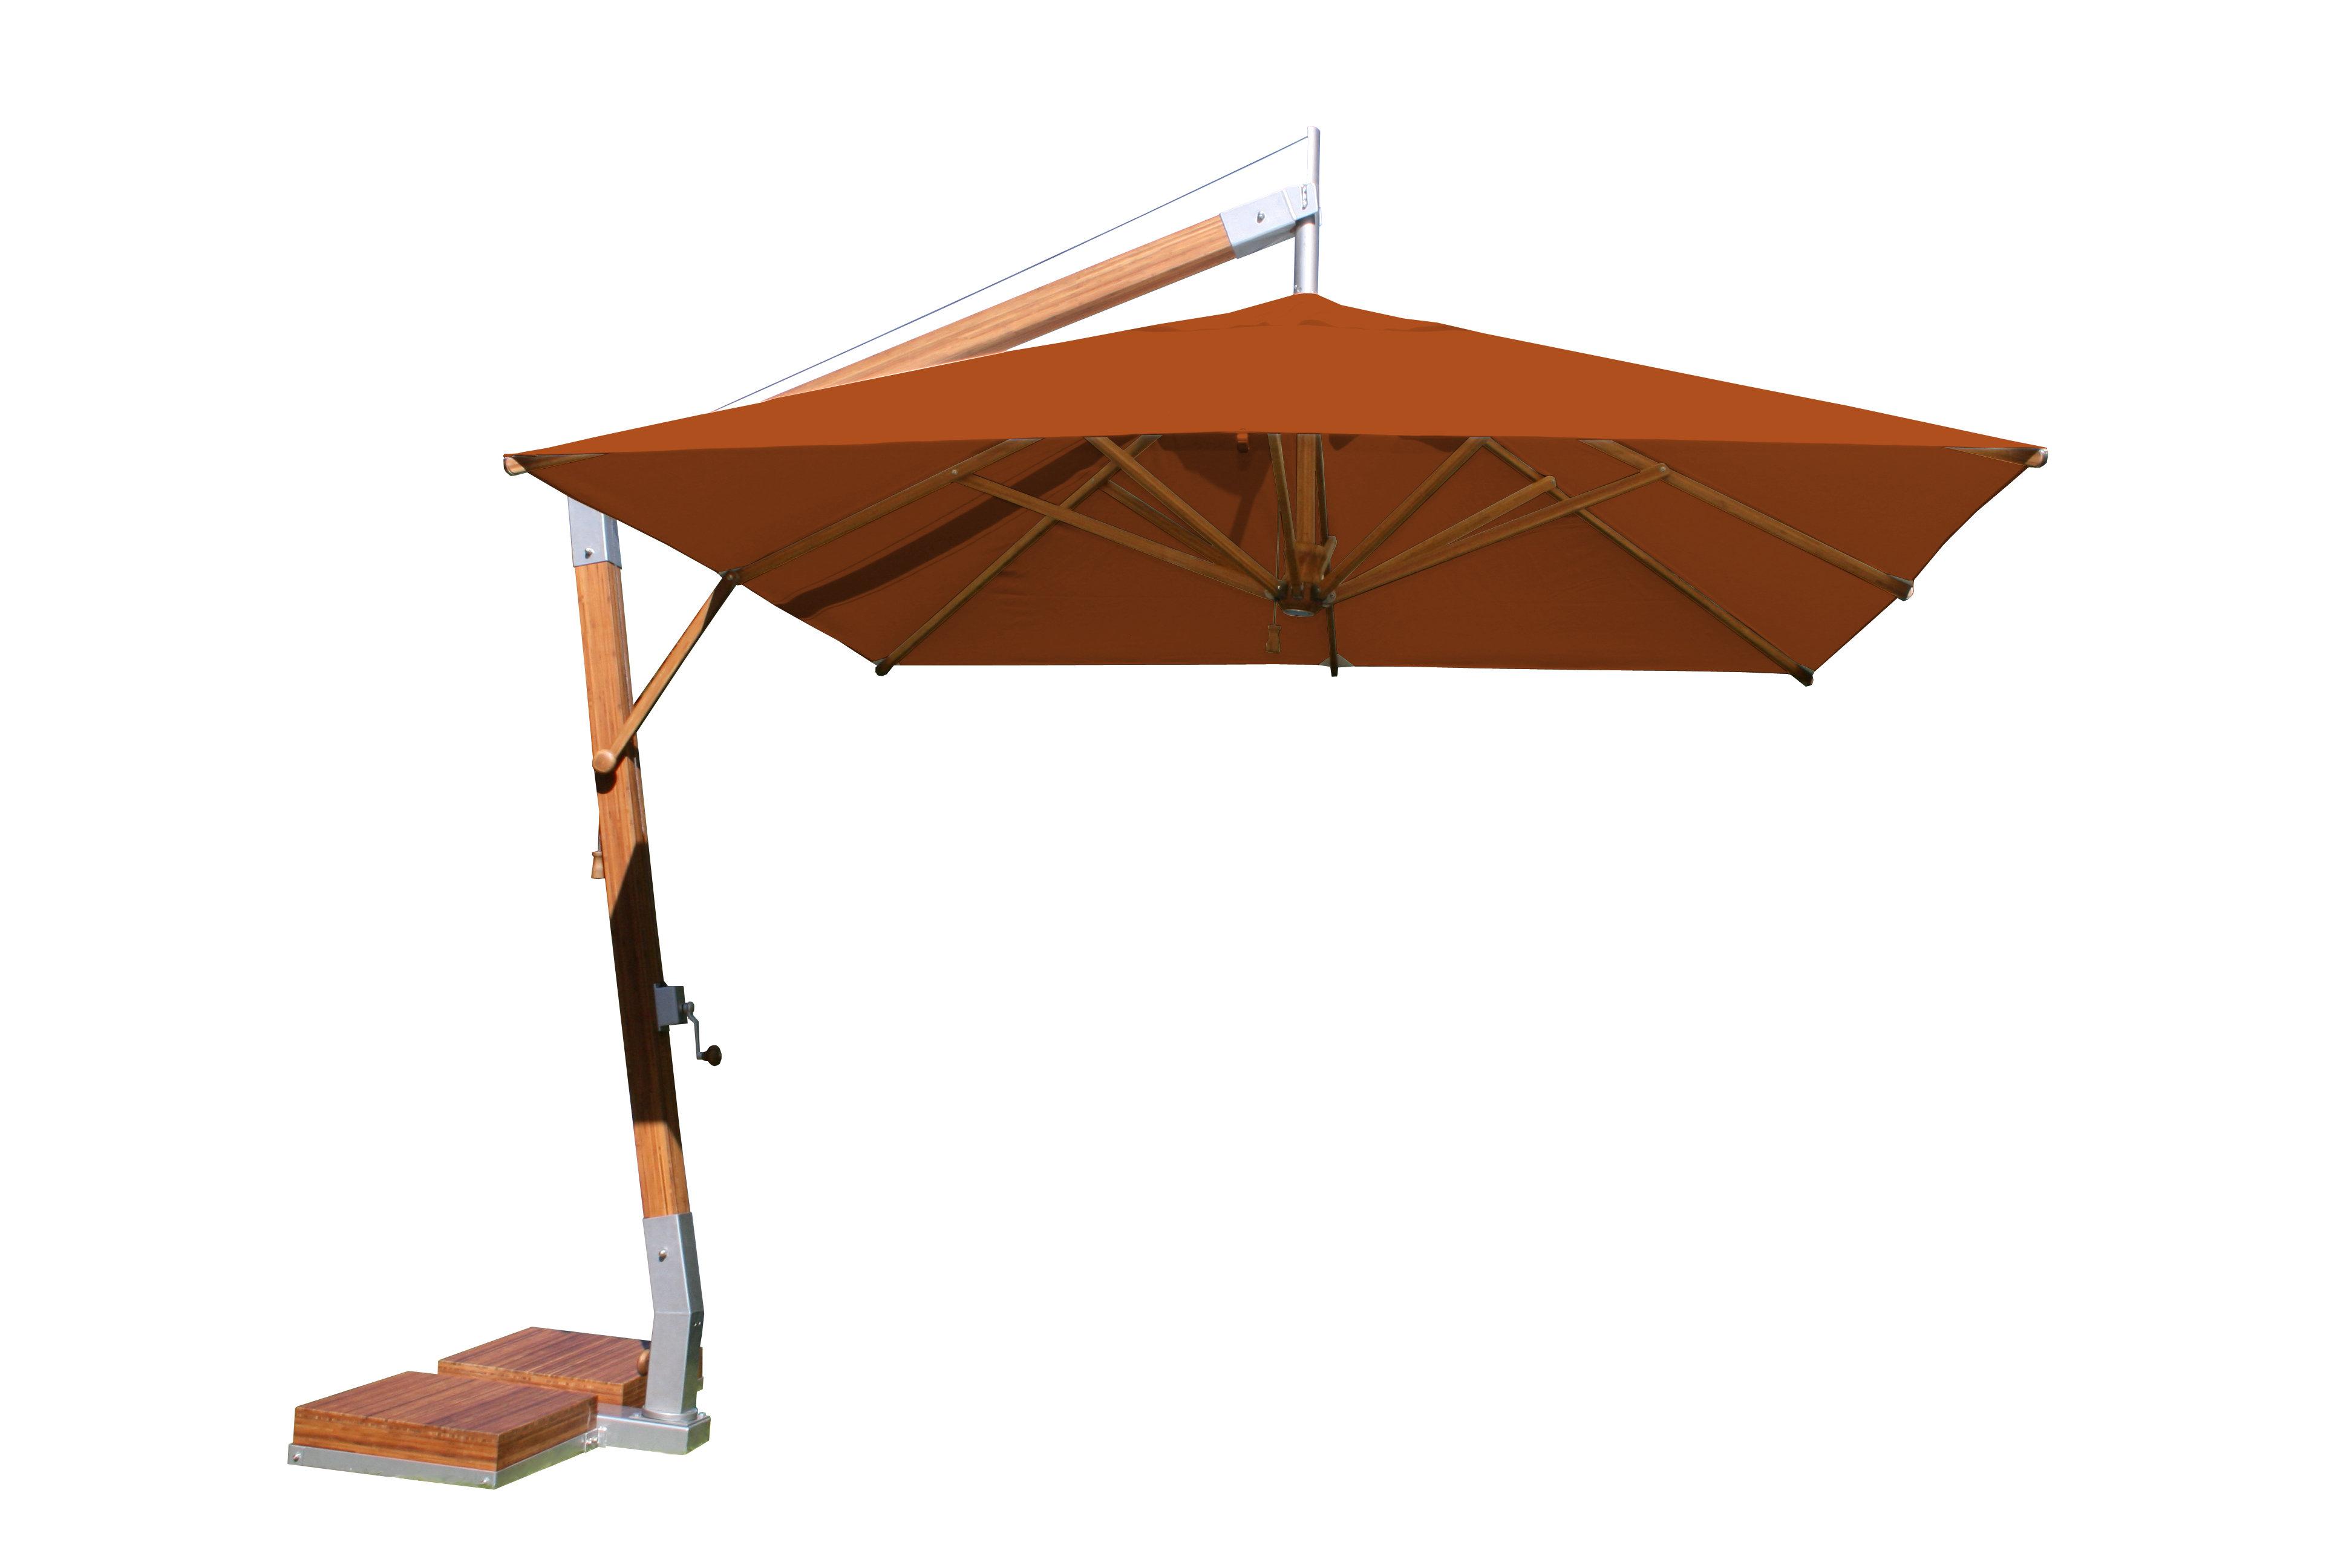 Charlton Home Rikard 10' Square Cantilever Umbrella Regarding Current Nasiba Square Cantilever Sunbrella Umbrellas (View 8 of 20)